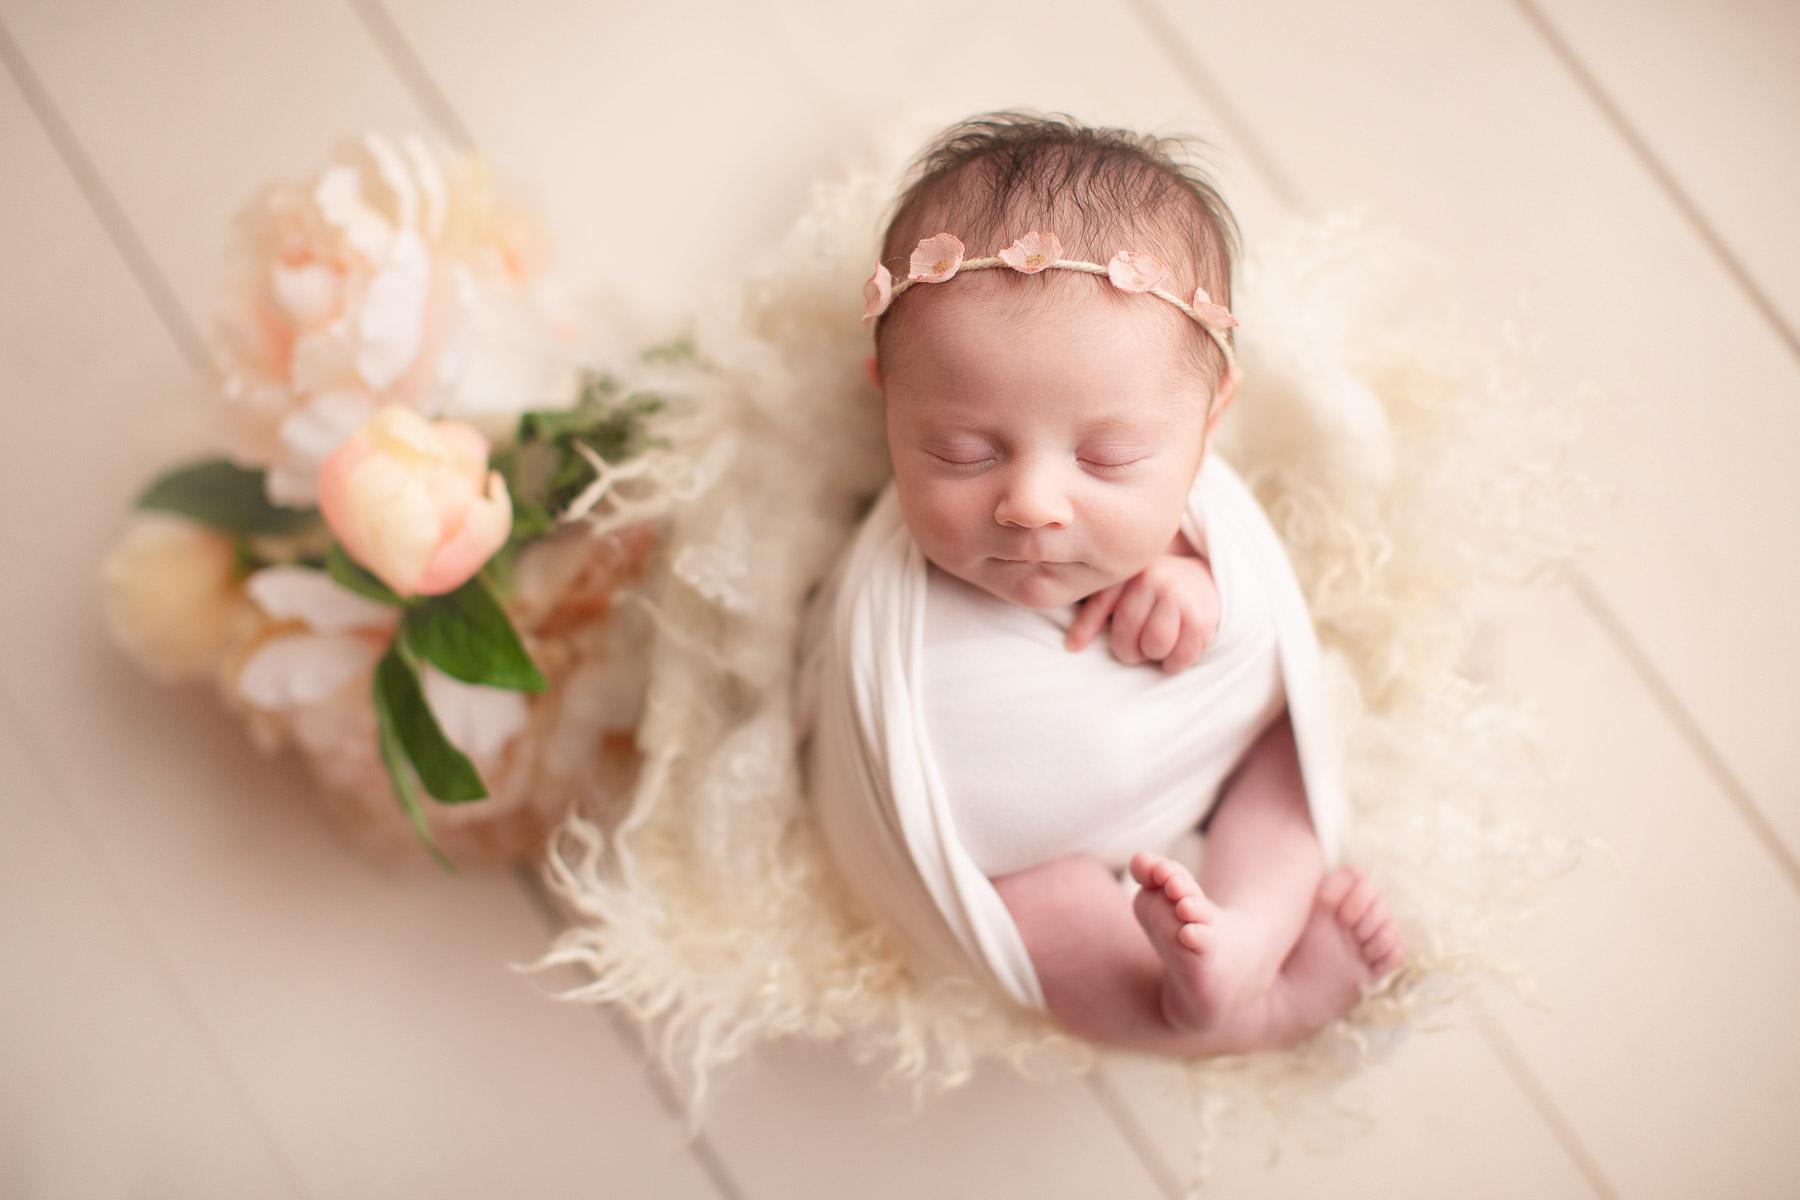 newborn girl- white setup whit flowers